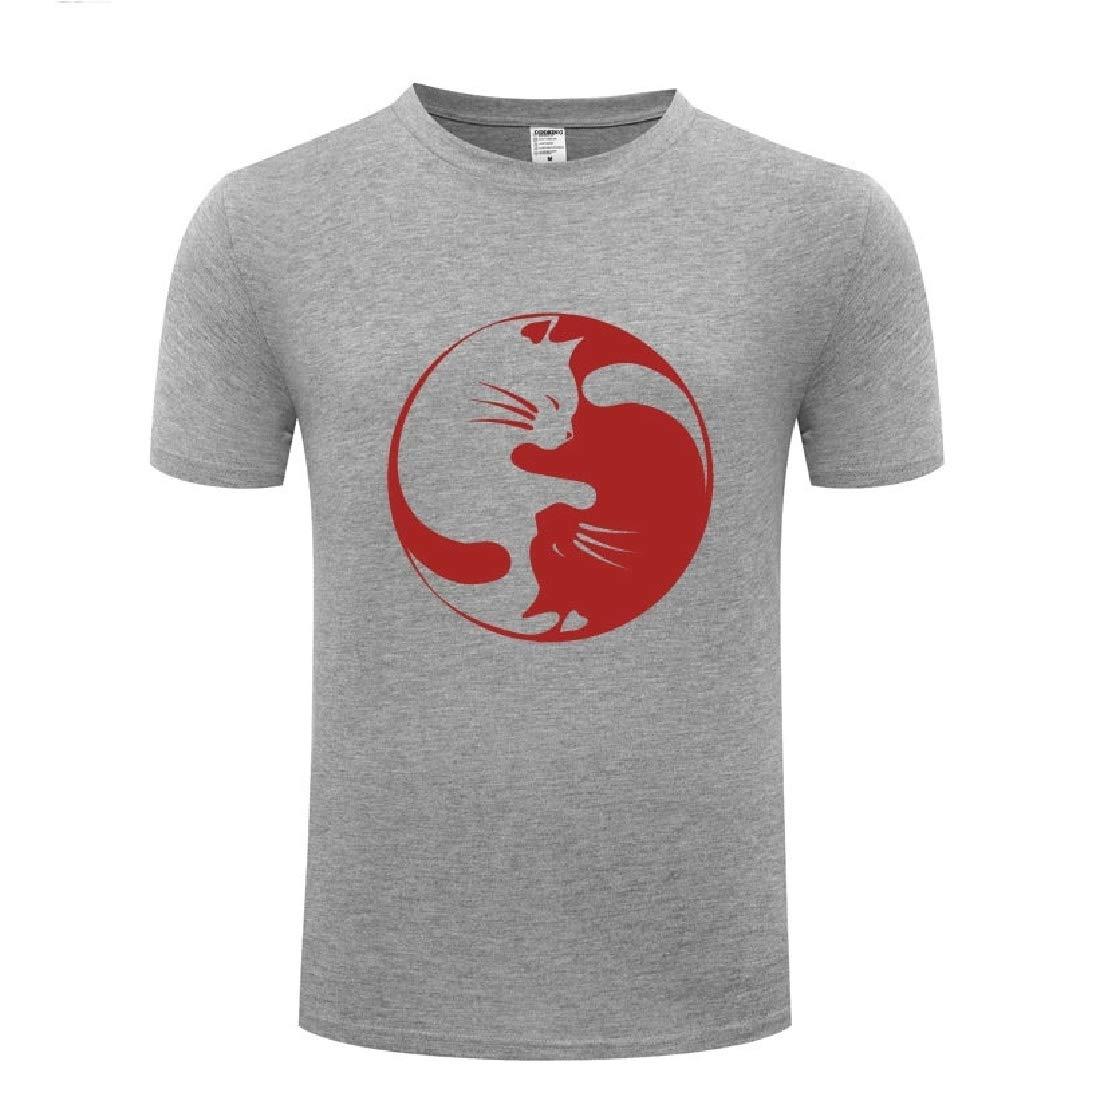 Rrive Men Short Sleeve Print Pullover Crew Neck T-Shirt Tee Top